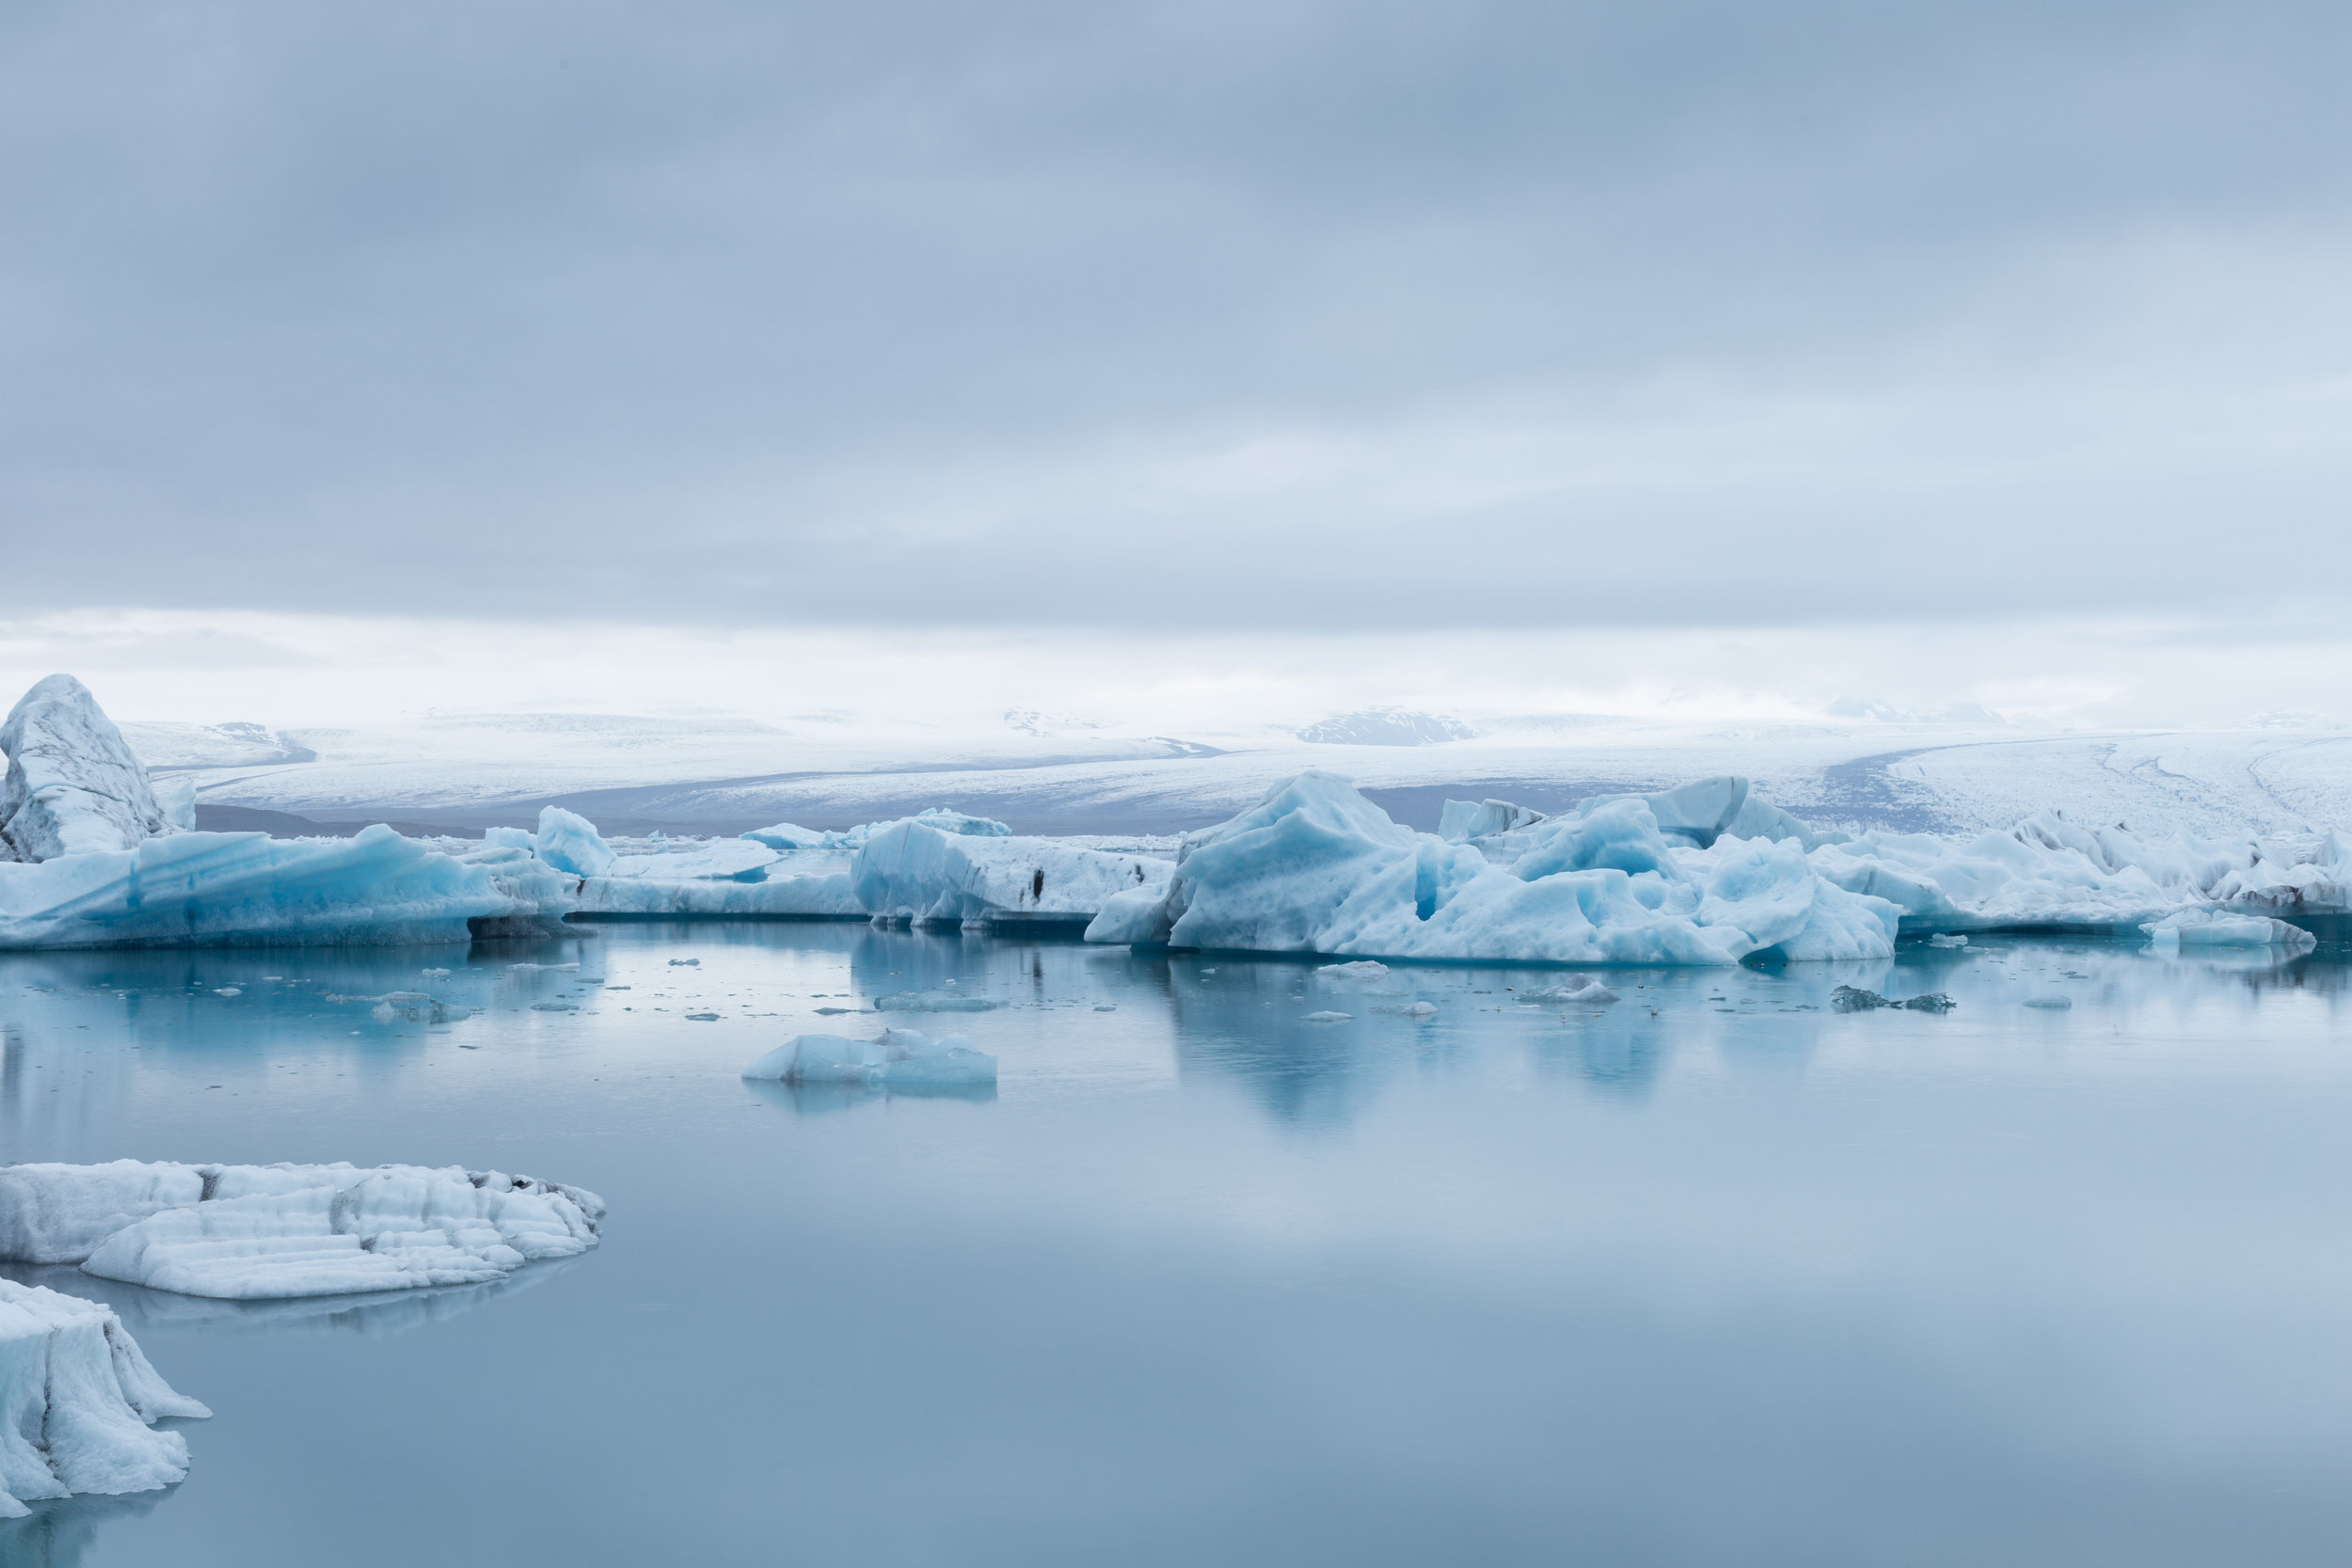 jokulsarlon-glacial-lagoon-iceland-2.jpg